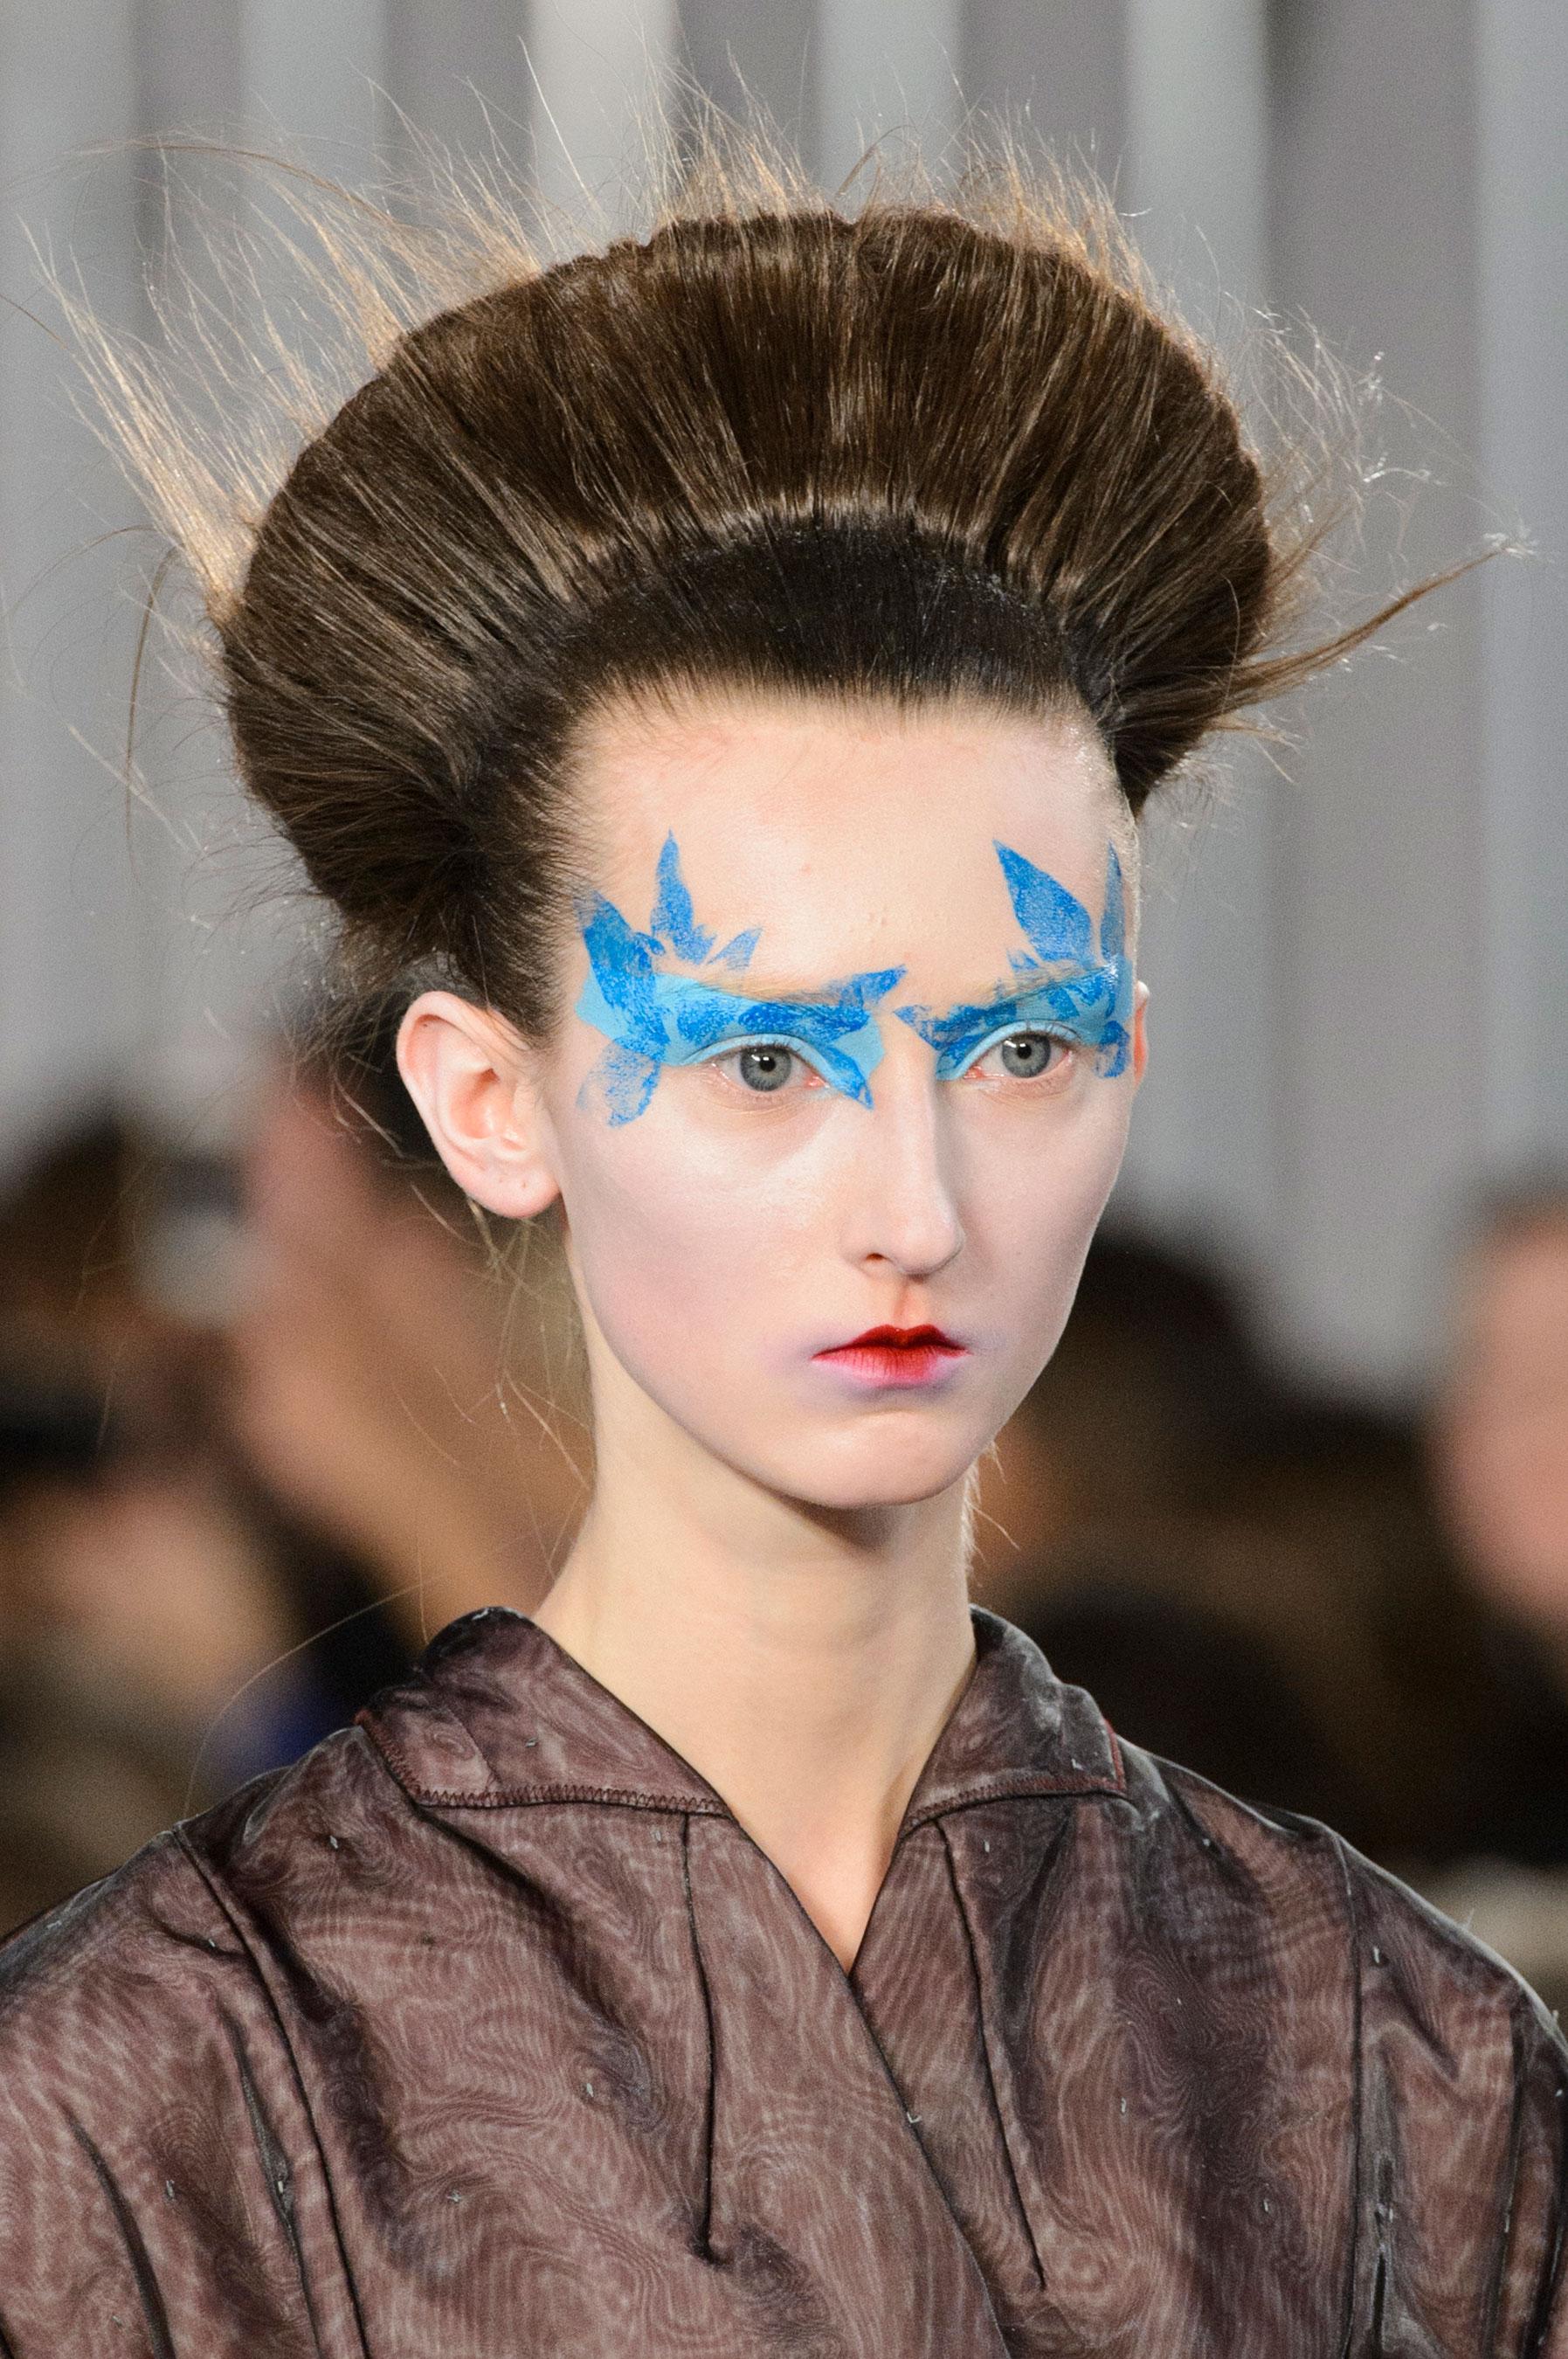 Maison-Margiela-spring-2016-runway-beauty-fashion-show-the-impression-021